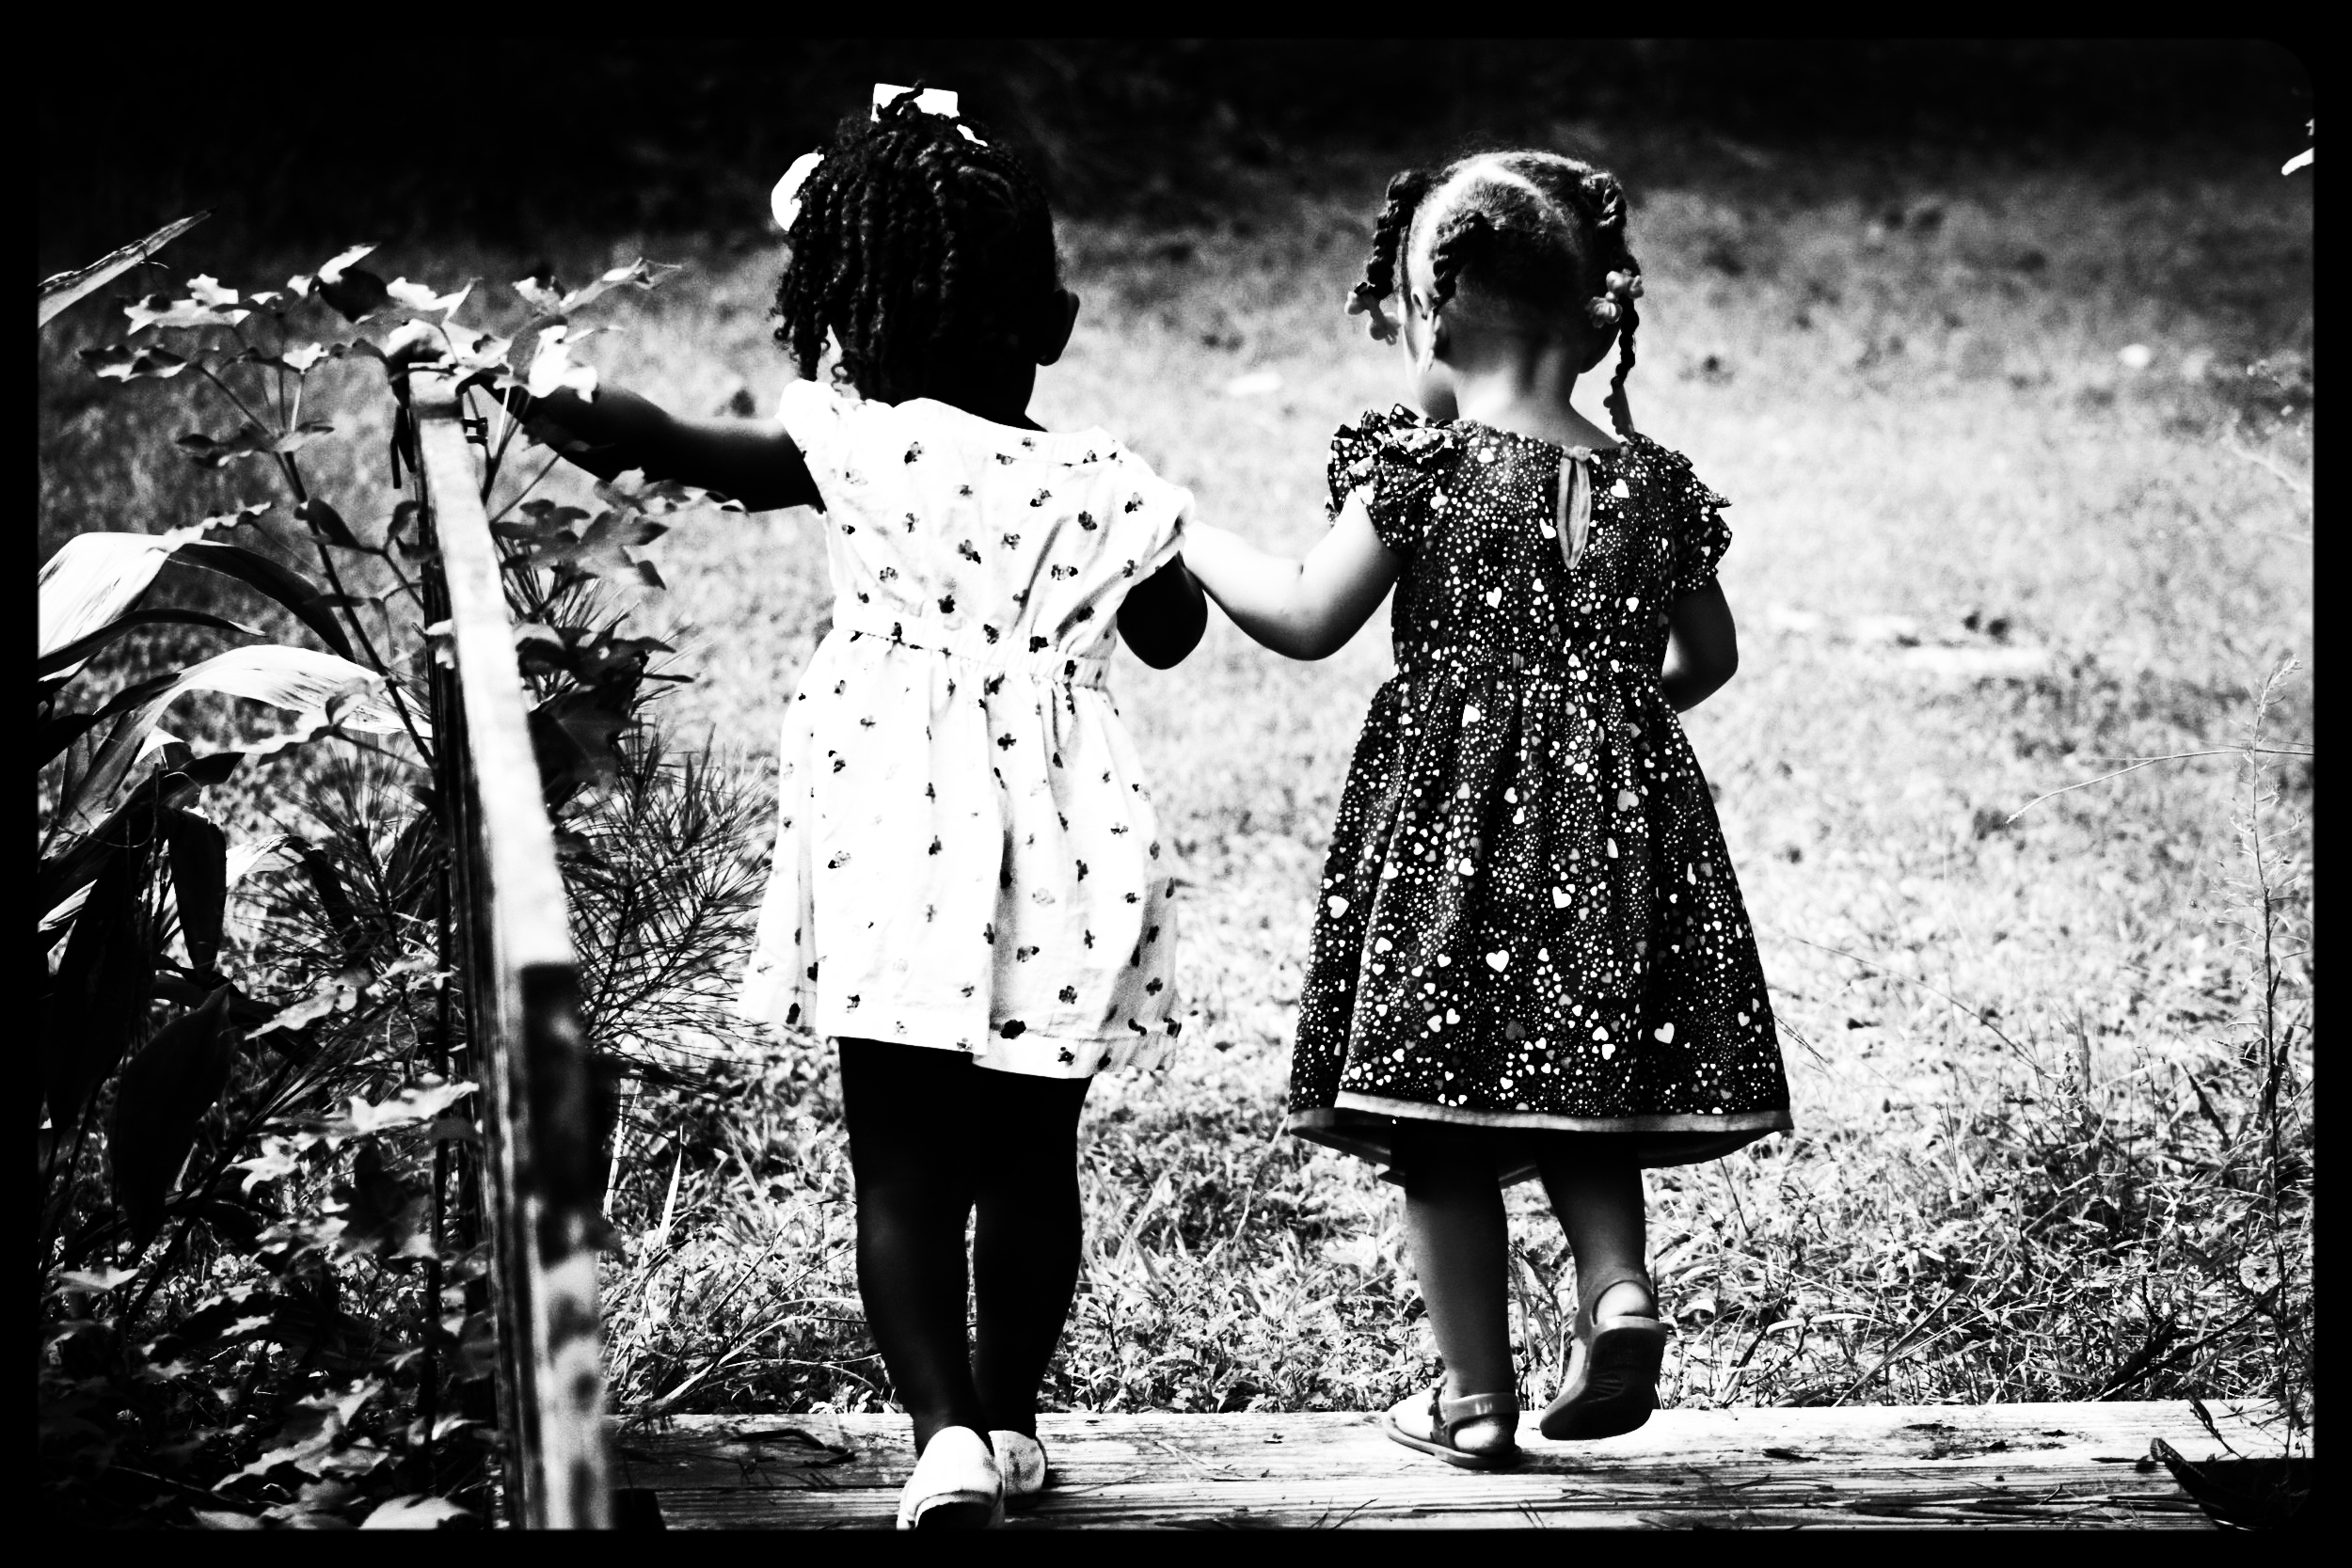 children-girls-kids-50581.jpg